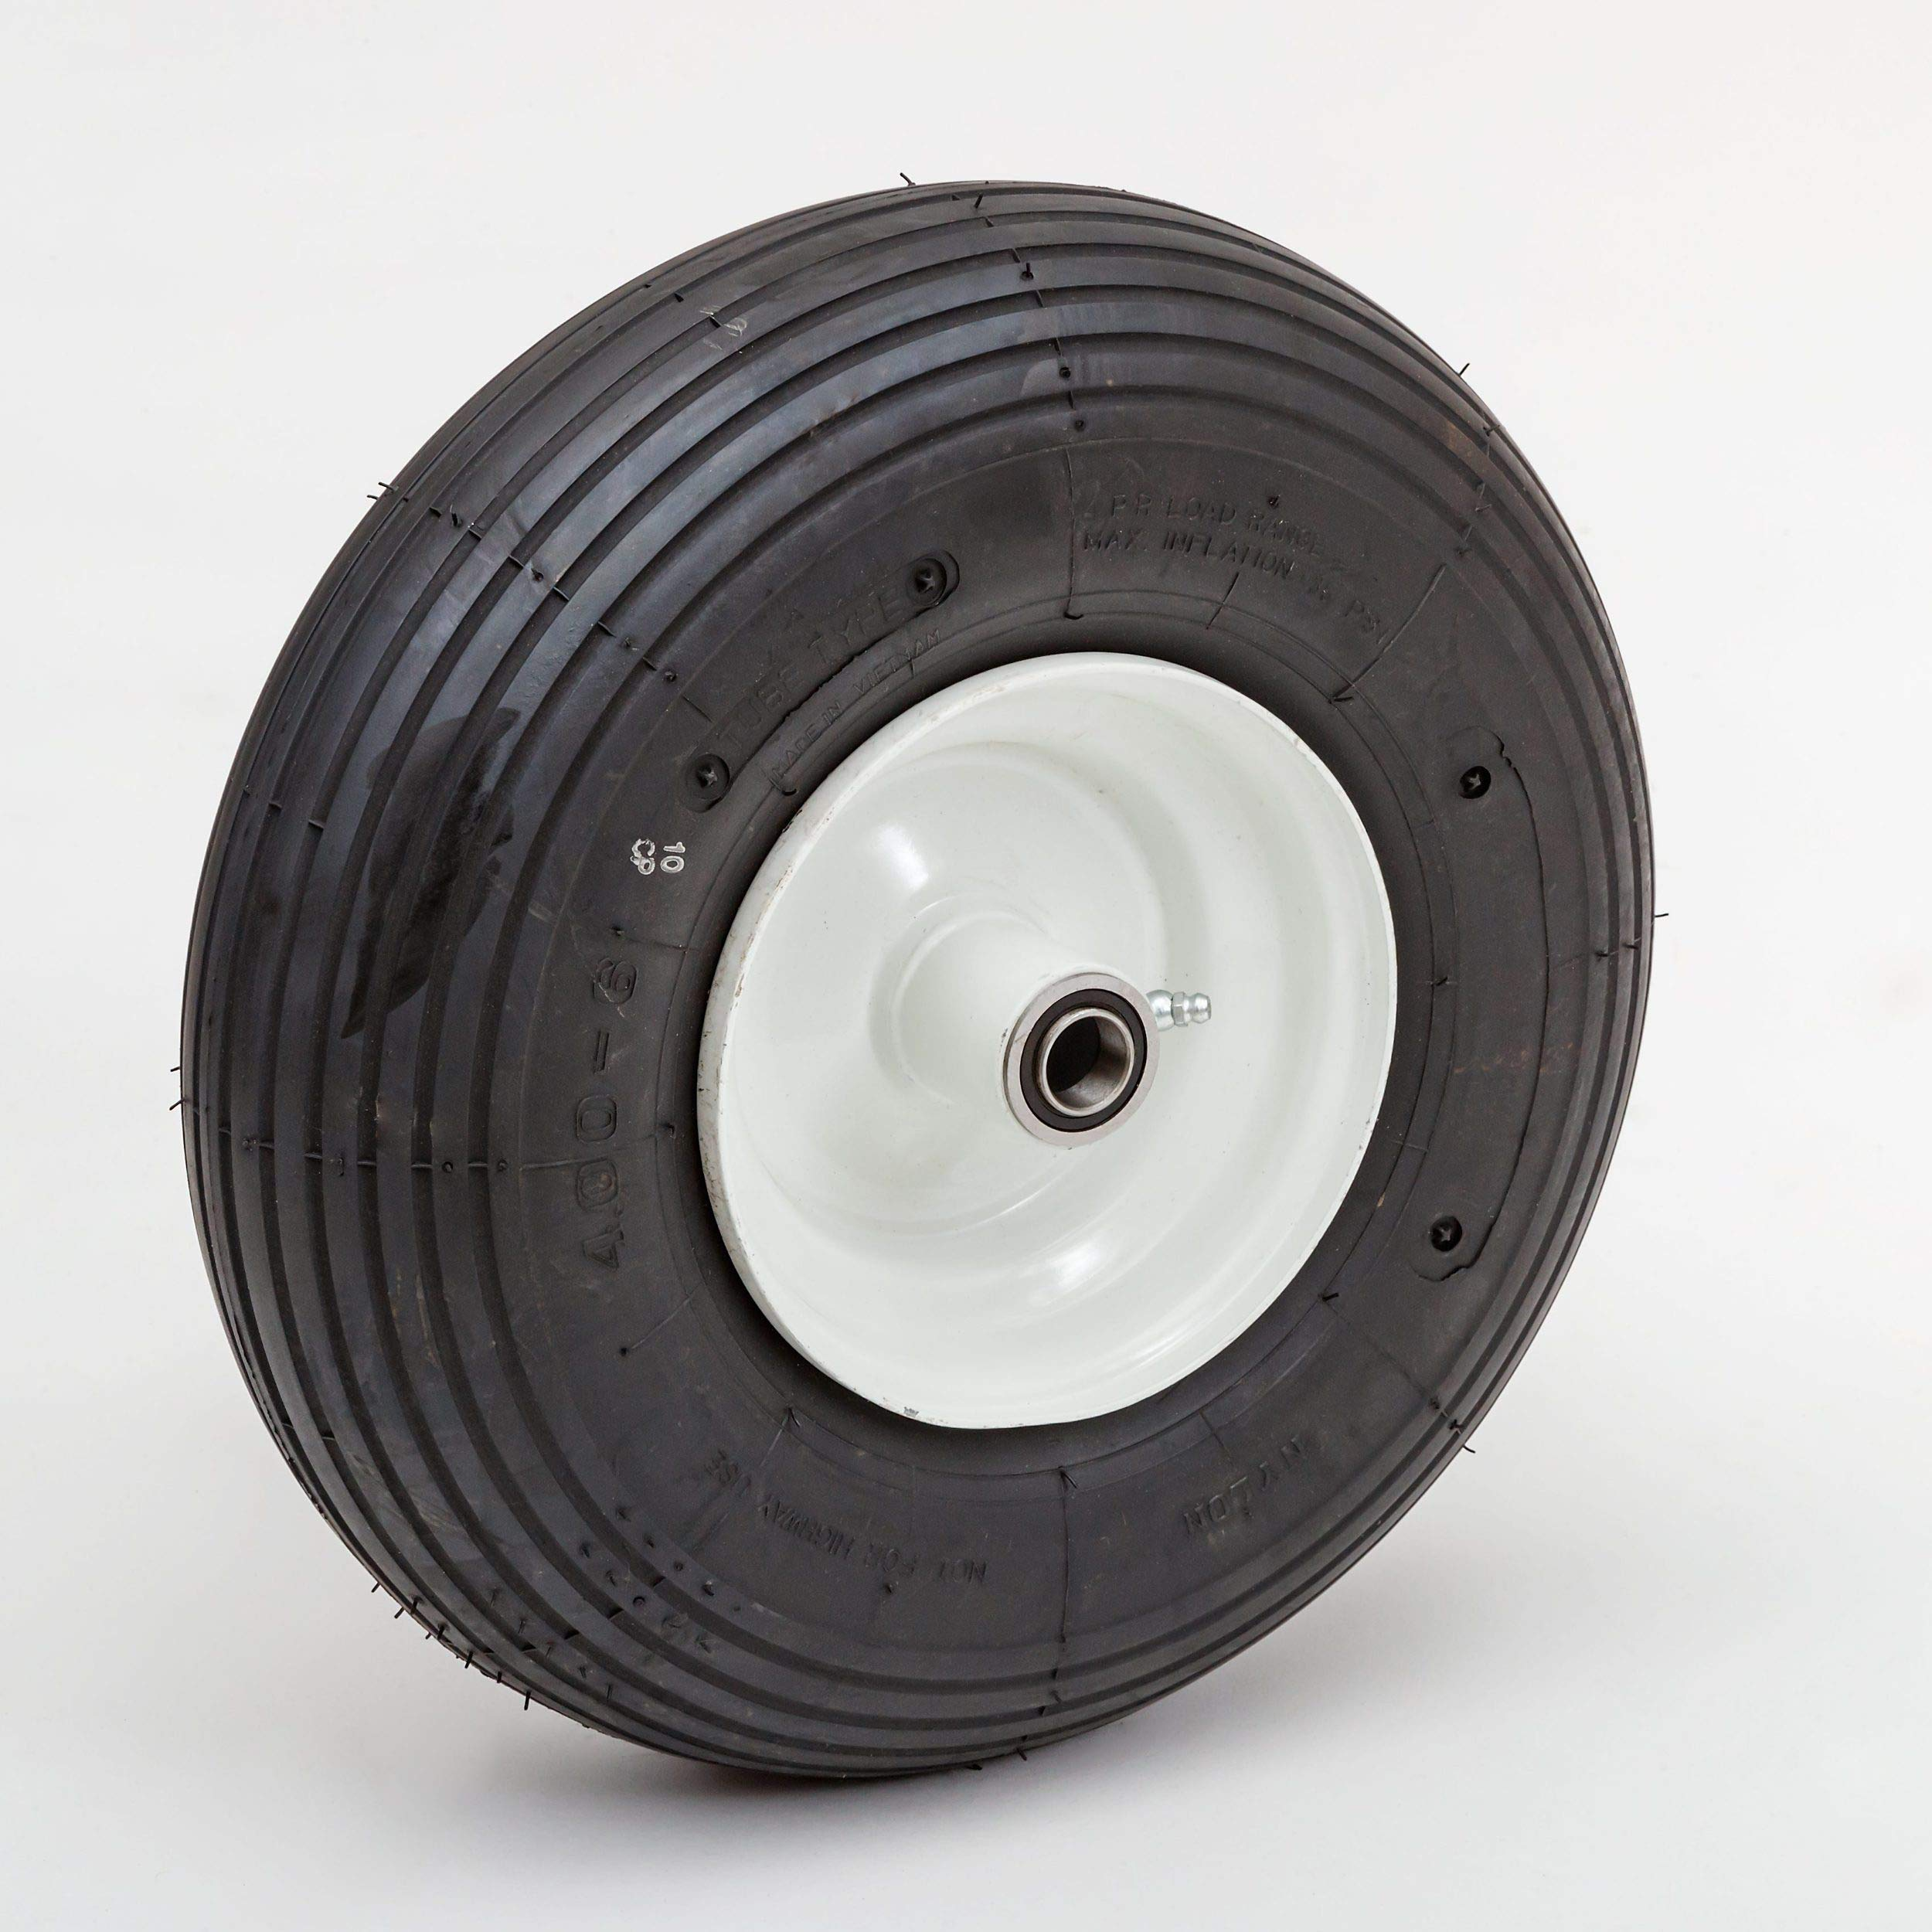 Lapp Wheels 13.6'' Pneumatic Wheel, Garden cart/Wagon/Wheelbarrow Replacement, 4.00-6 Wheel Size, Hub/Bearing Size Options